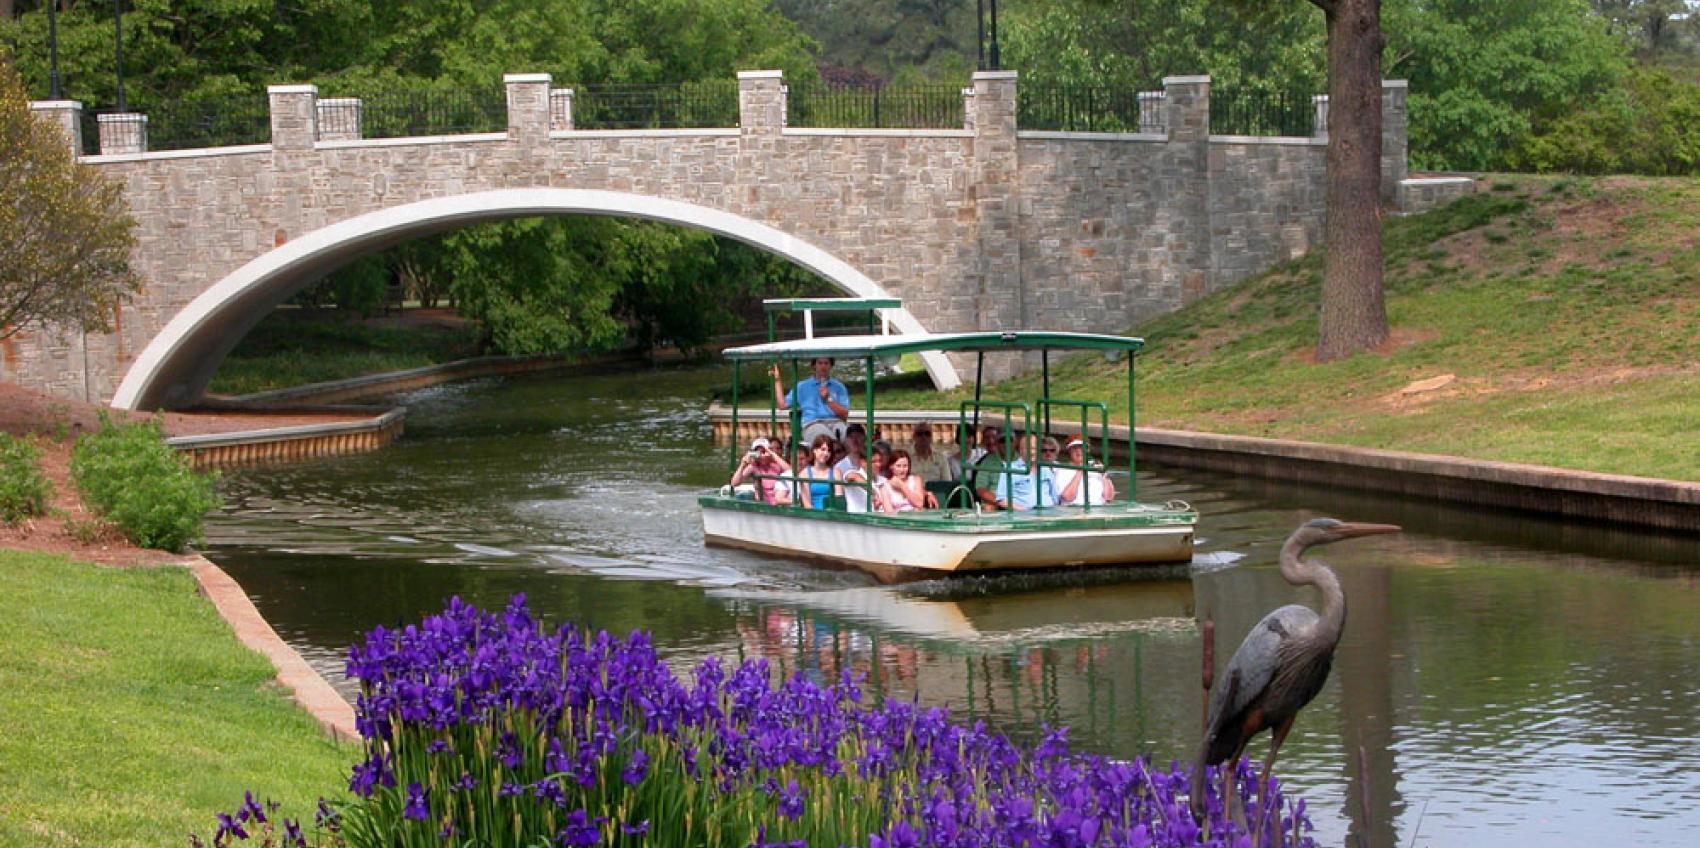 Norfolk Botanical Garden | American Public Gardens Association